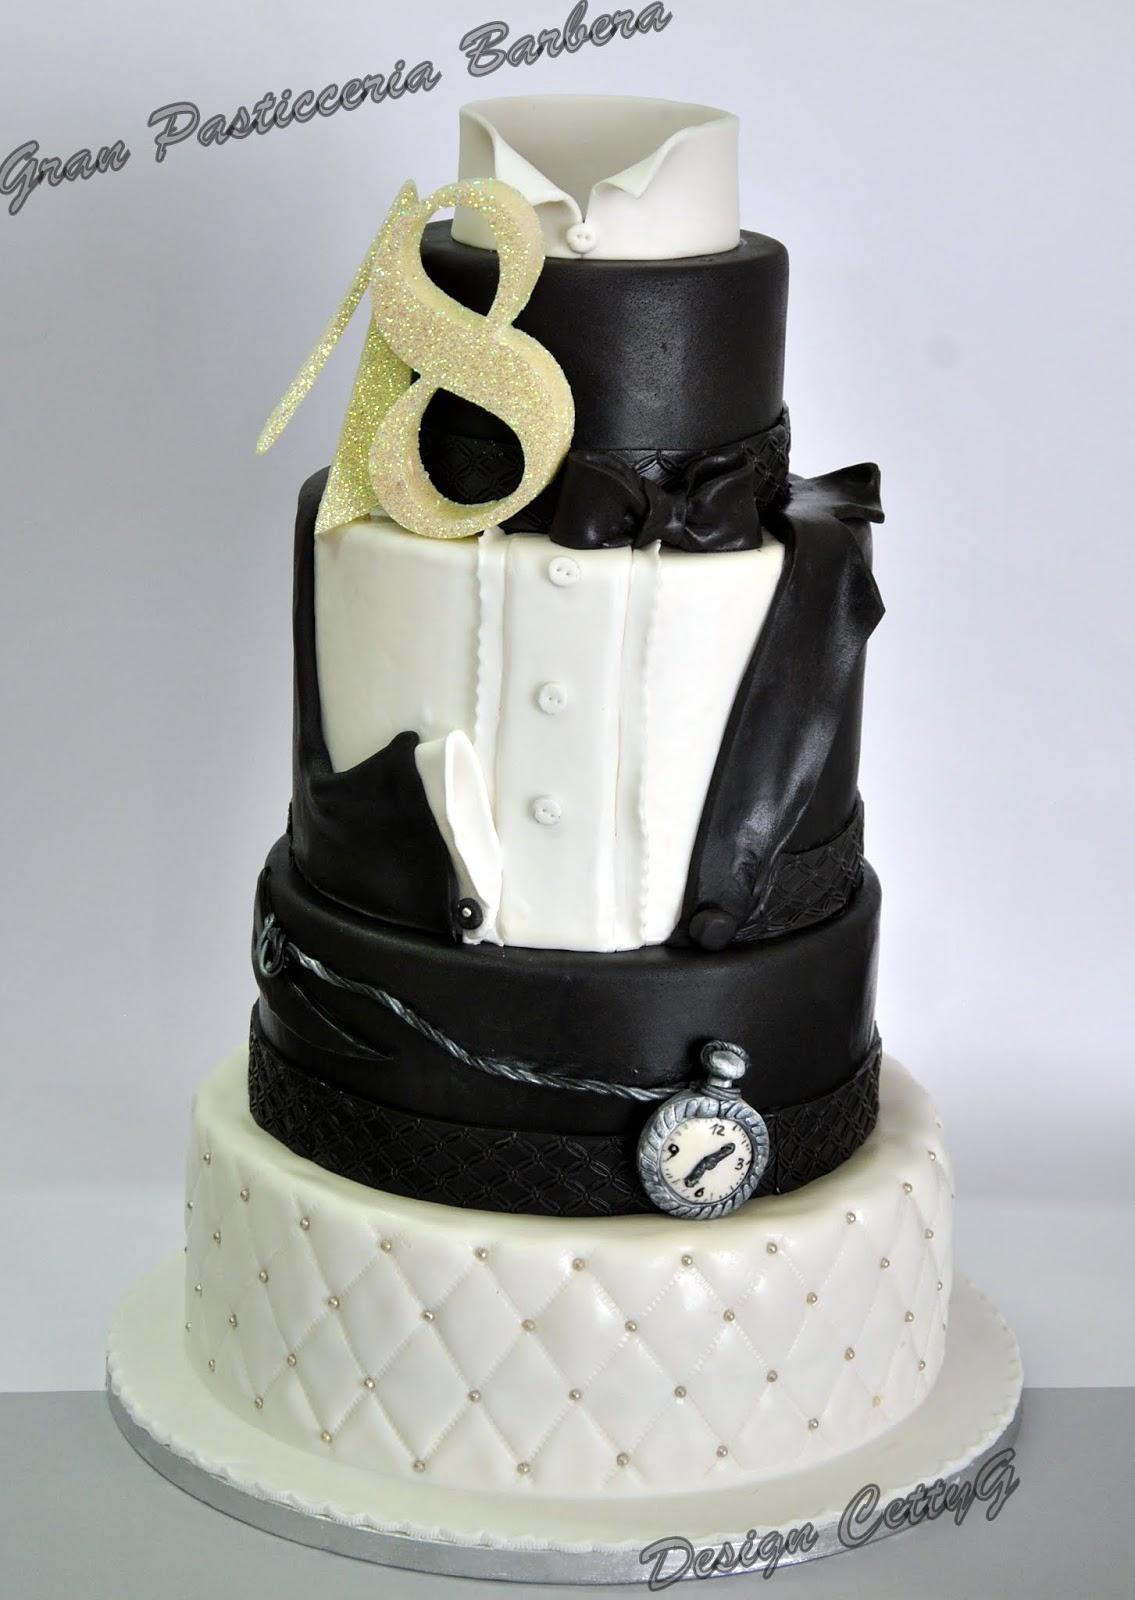 Le Torte Decorate Di Cetty G 18 Compleanno In Smoking